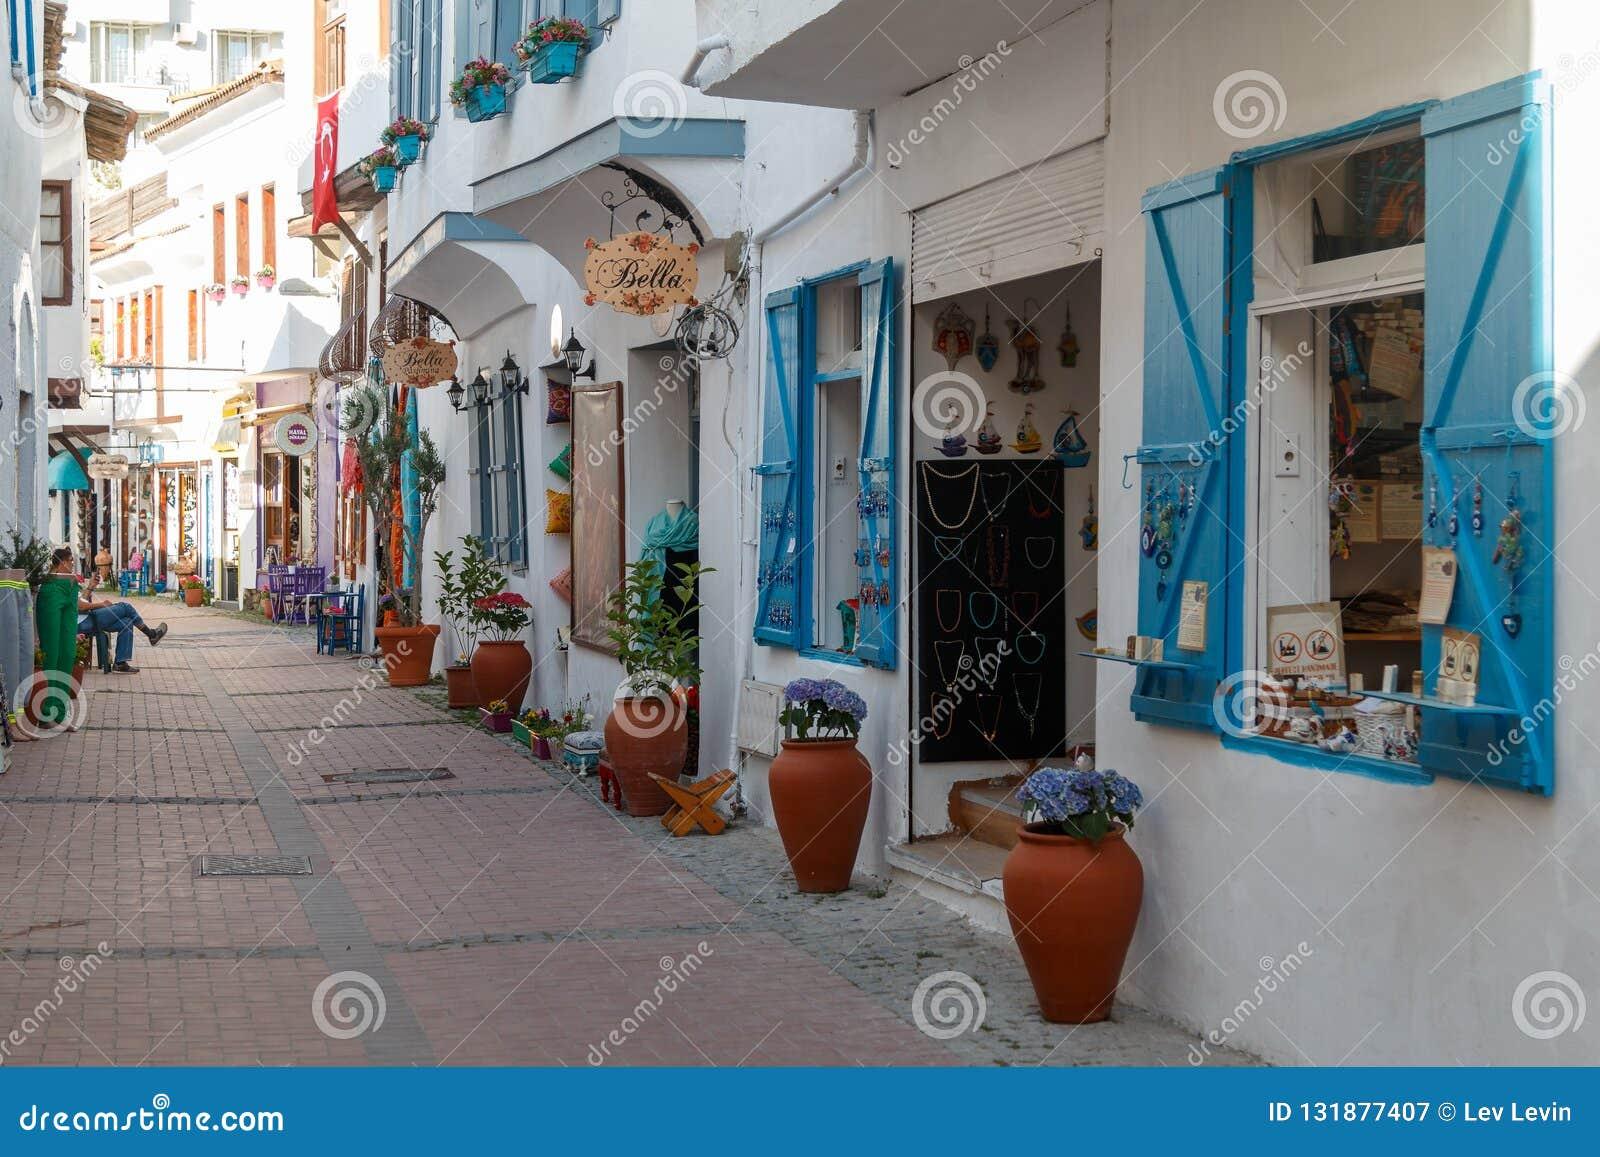 Trade touristic street in the centre of Kusadasi